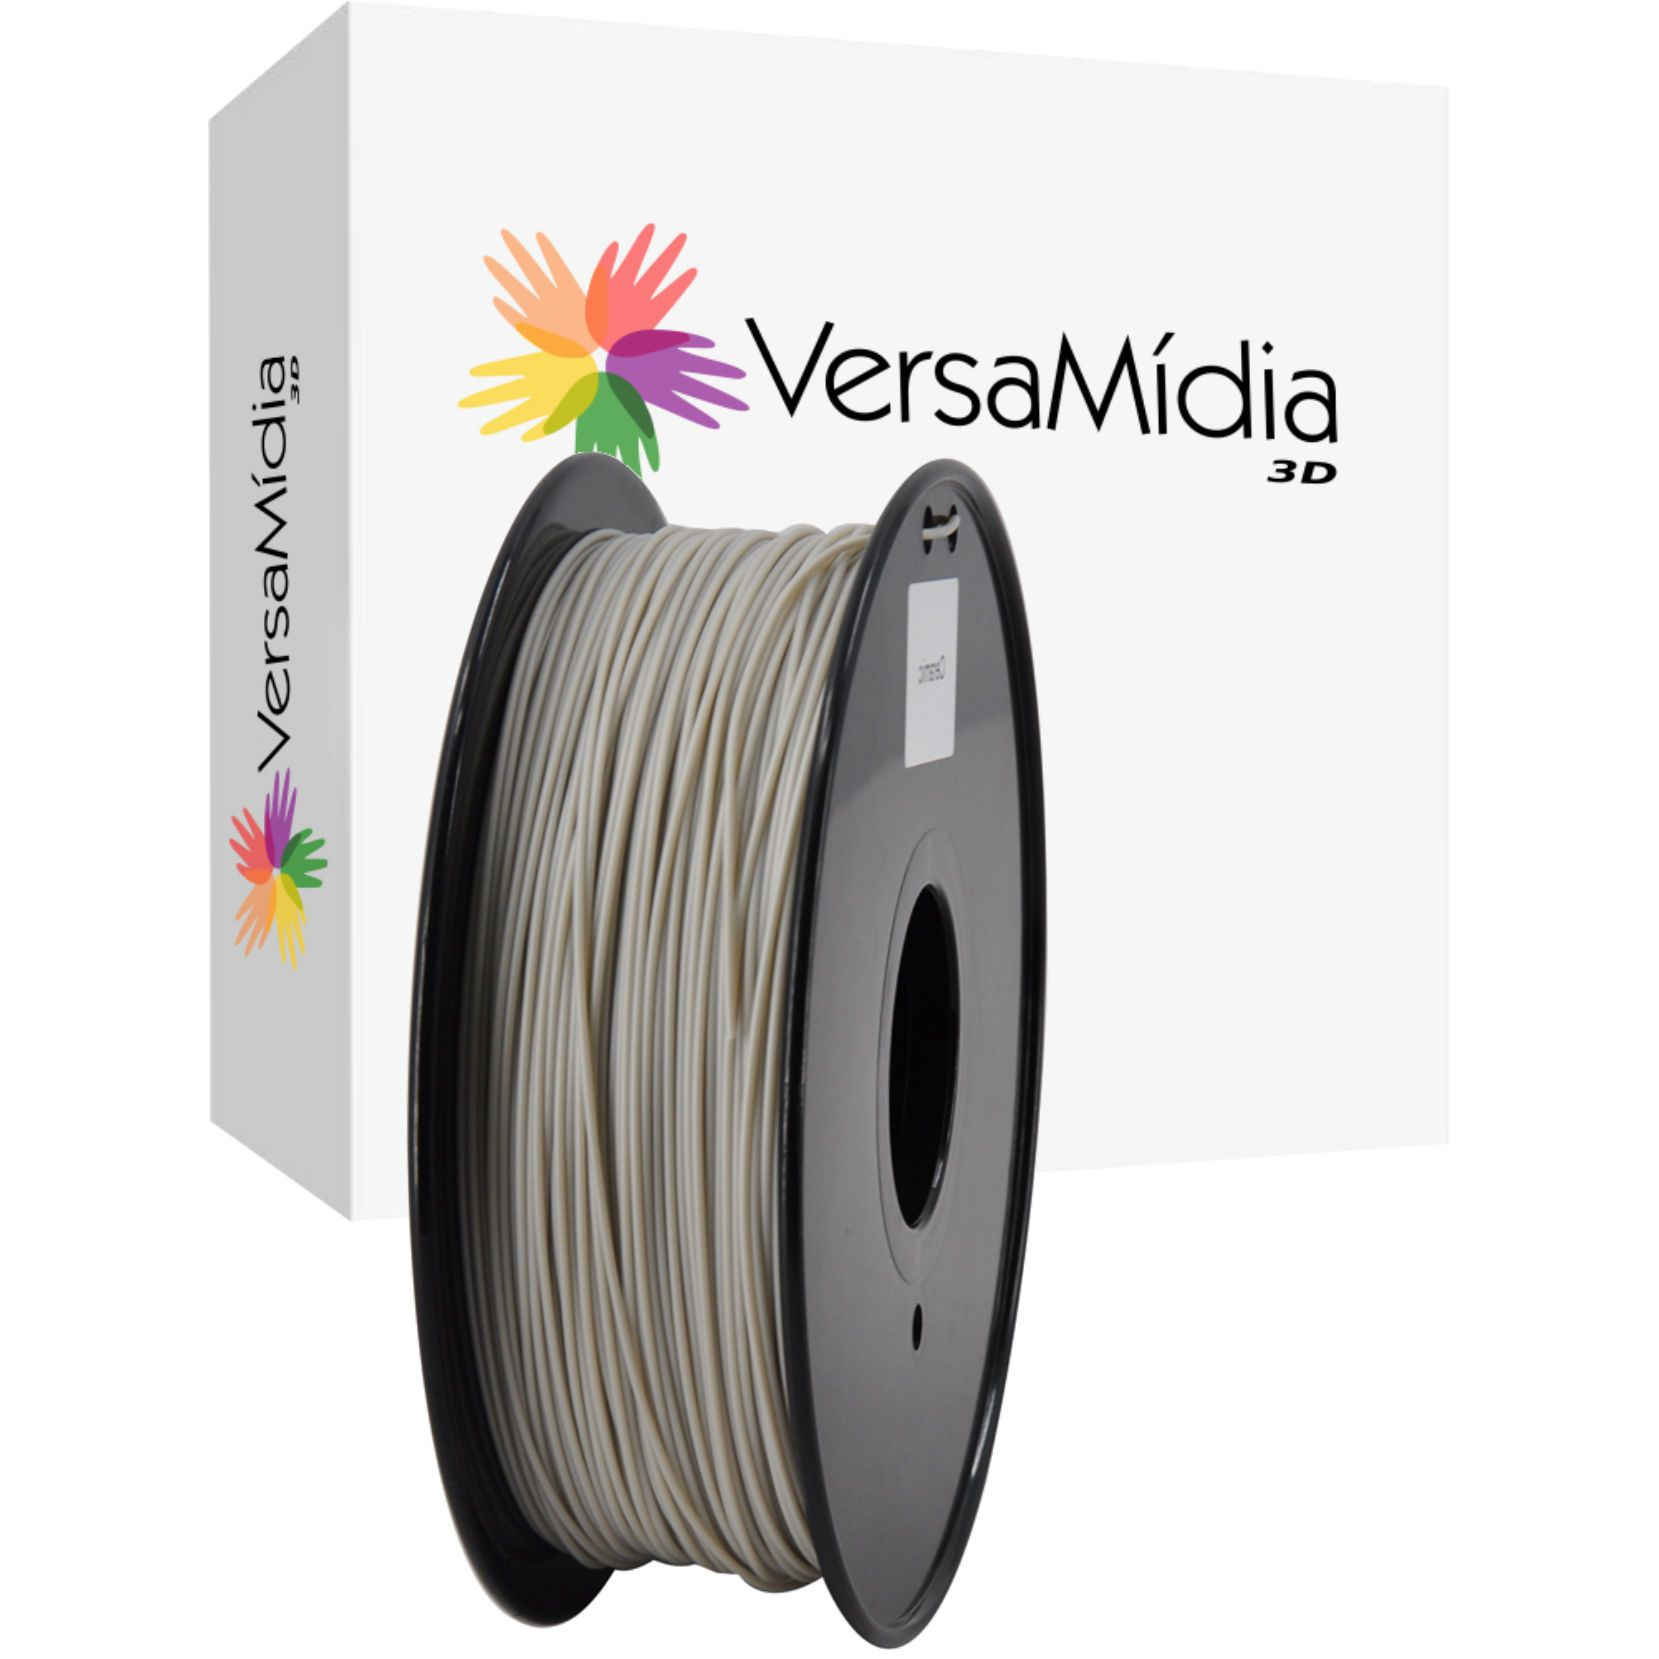 Filamento Ceramic PLA  VersaMídia 3D Premium  1.75mm Black Spool - 11517